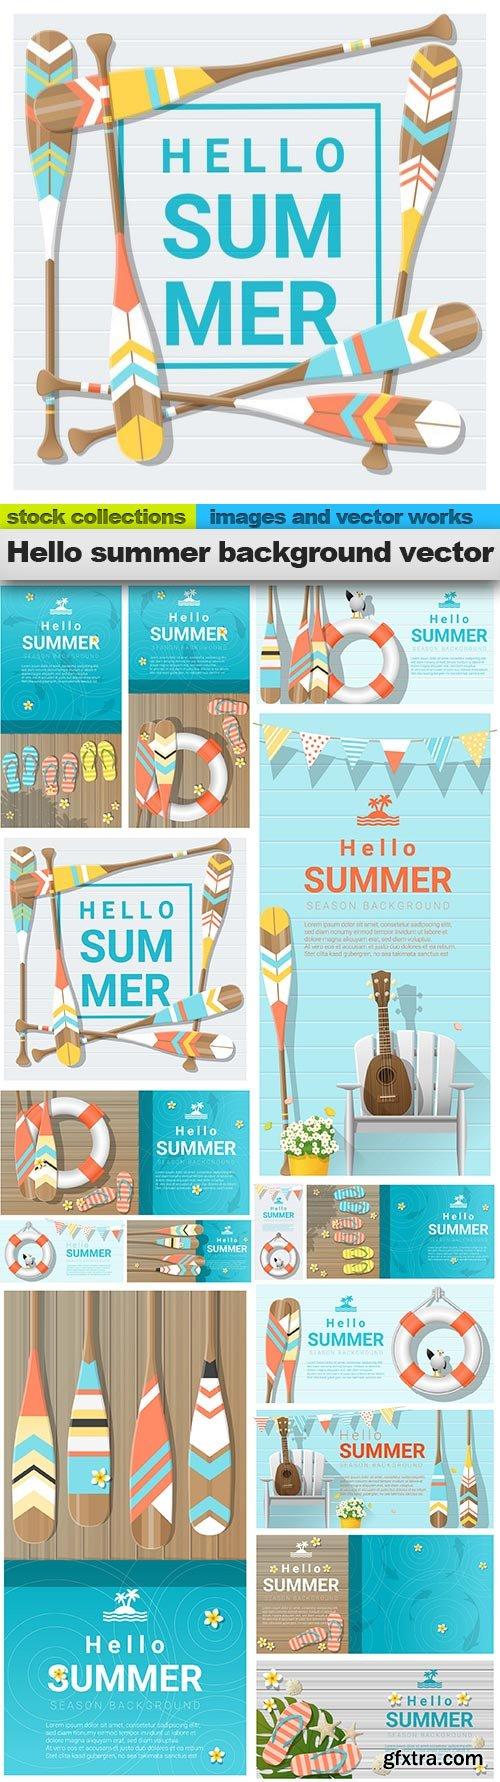 Hello summer background vector, 15 x EPS